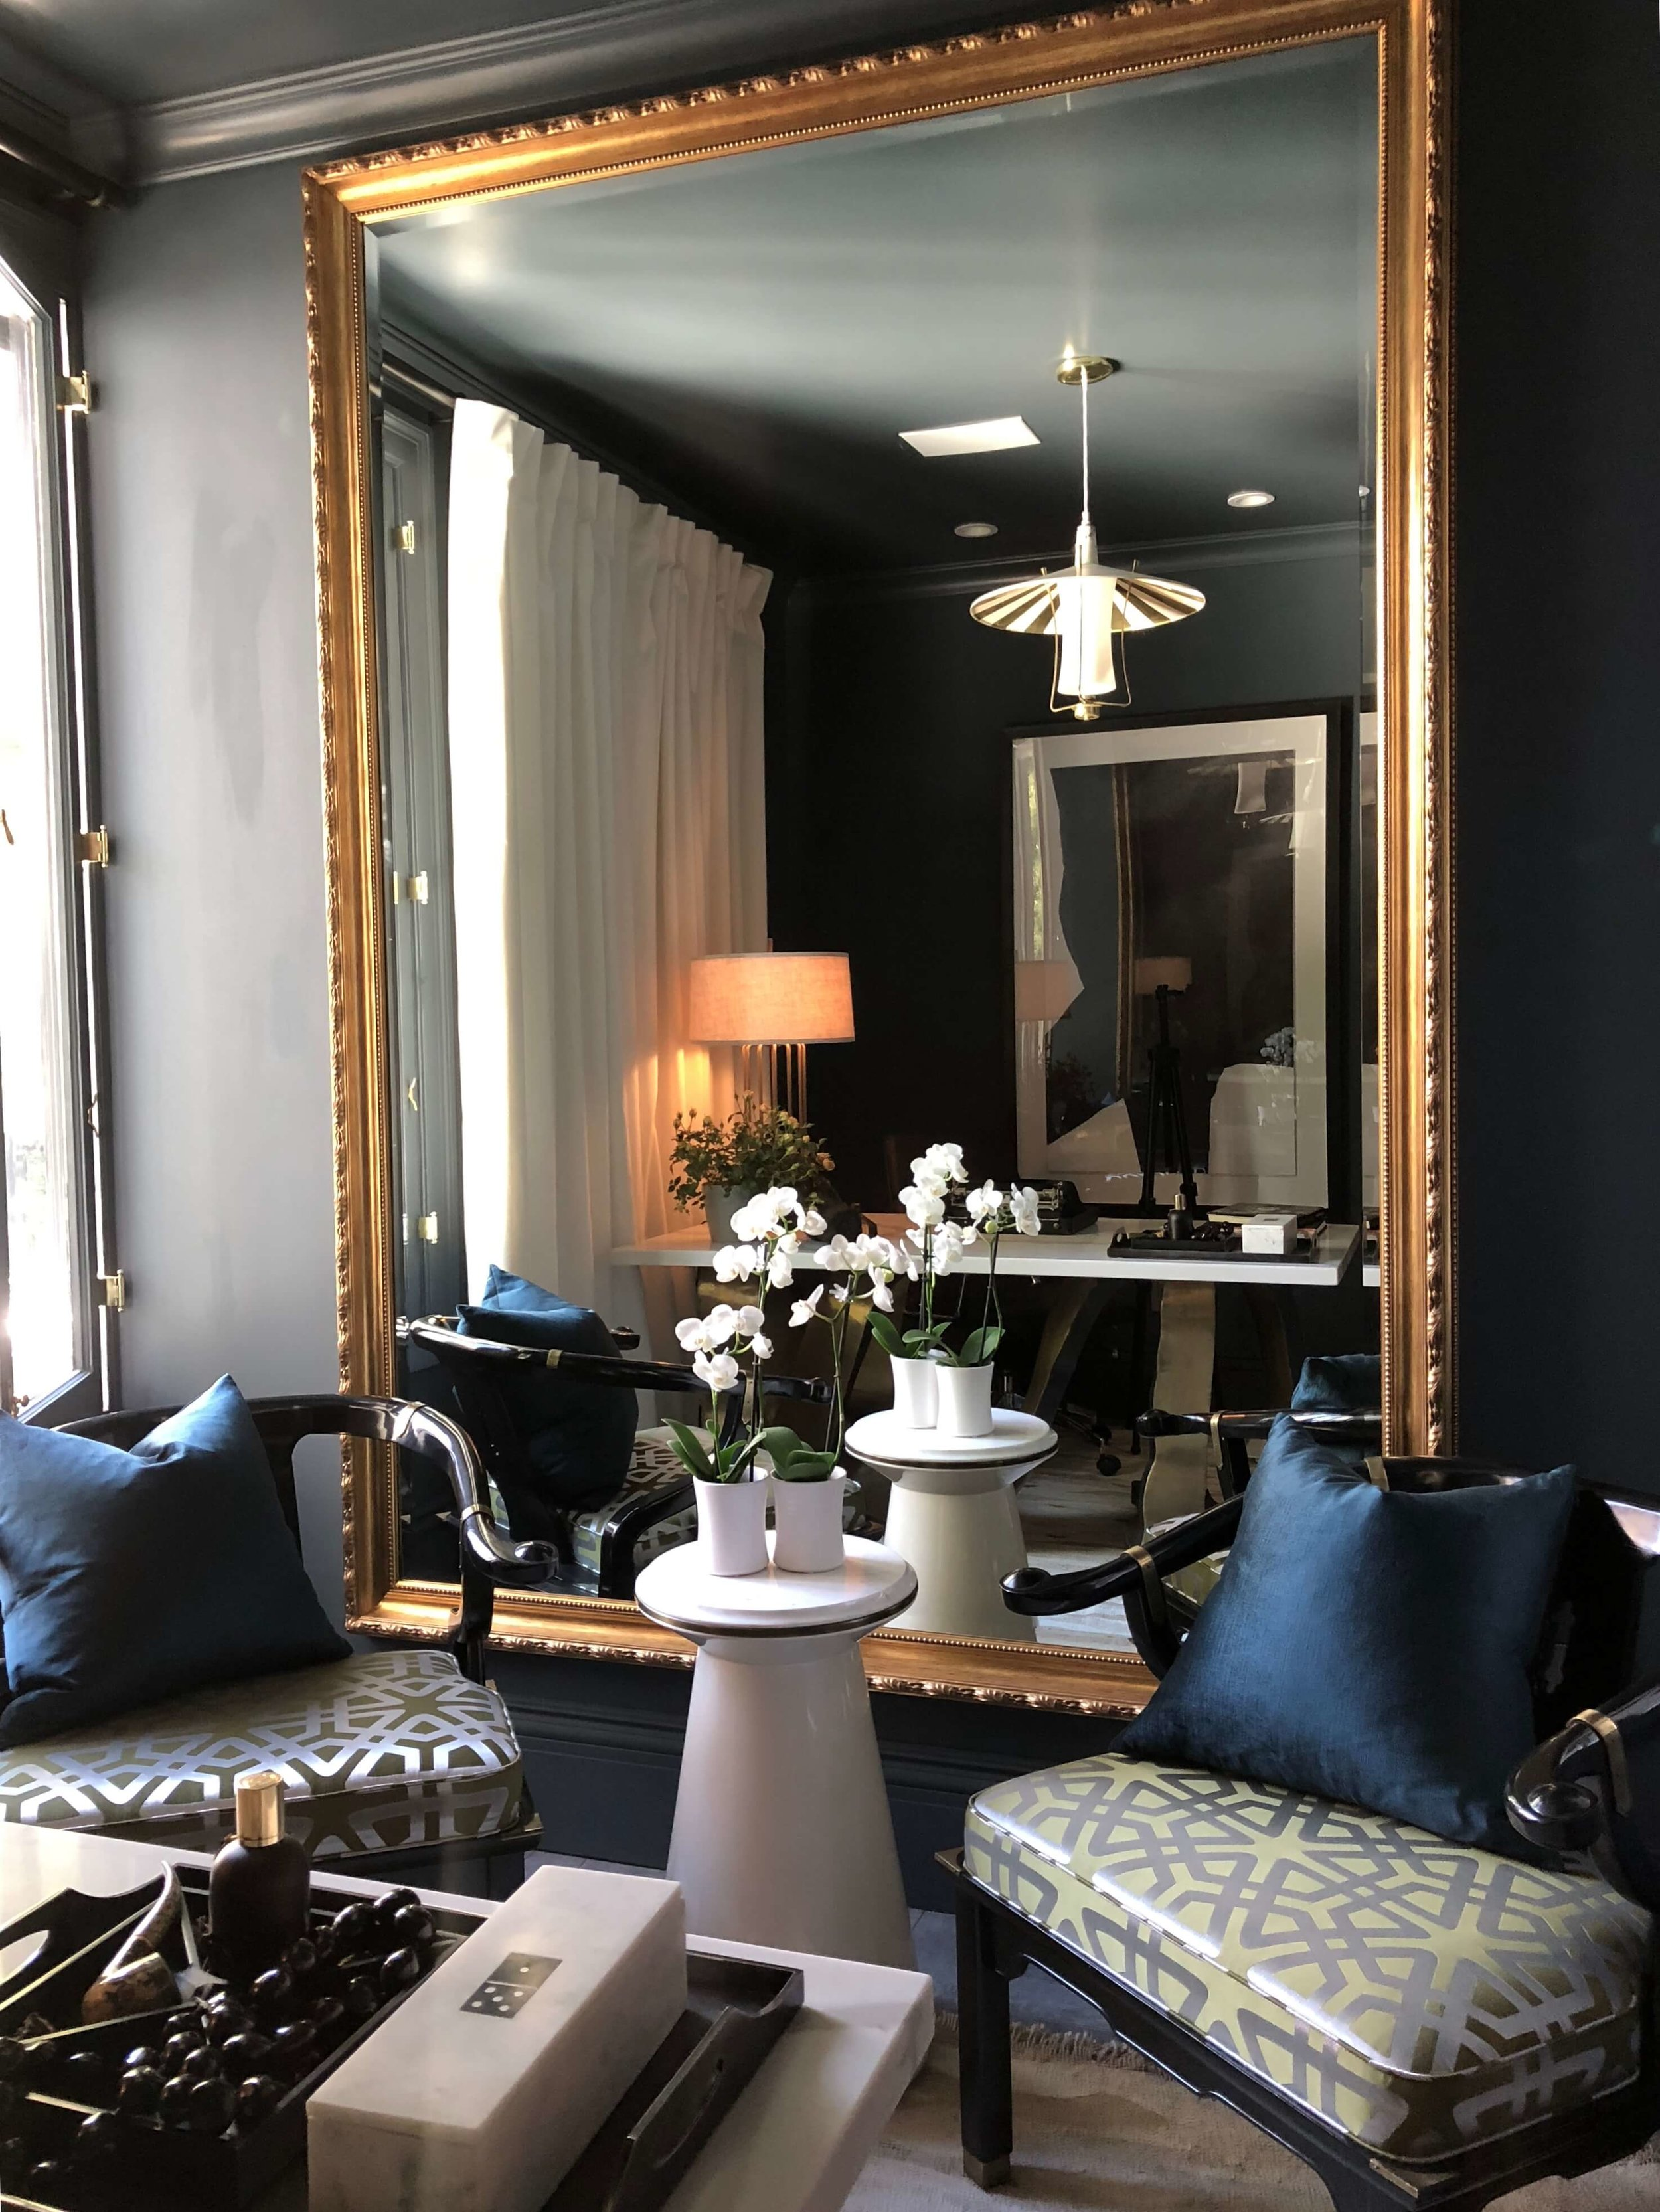 Modern Man's Retreat designed by Xander Noori, with oversized mirror and dark gray walls #study #homeoffice #masculinedesign #mancave